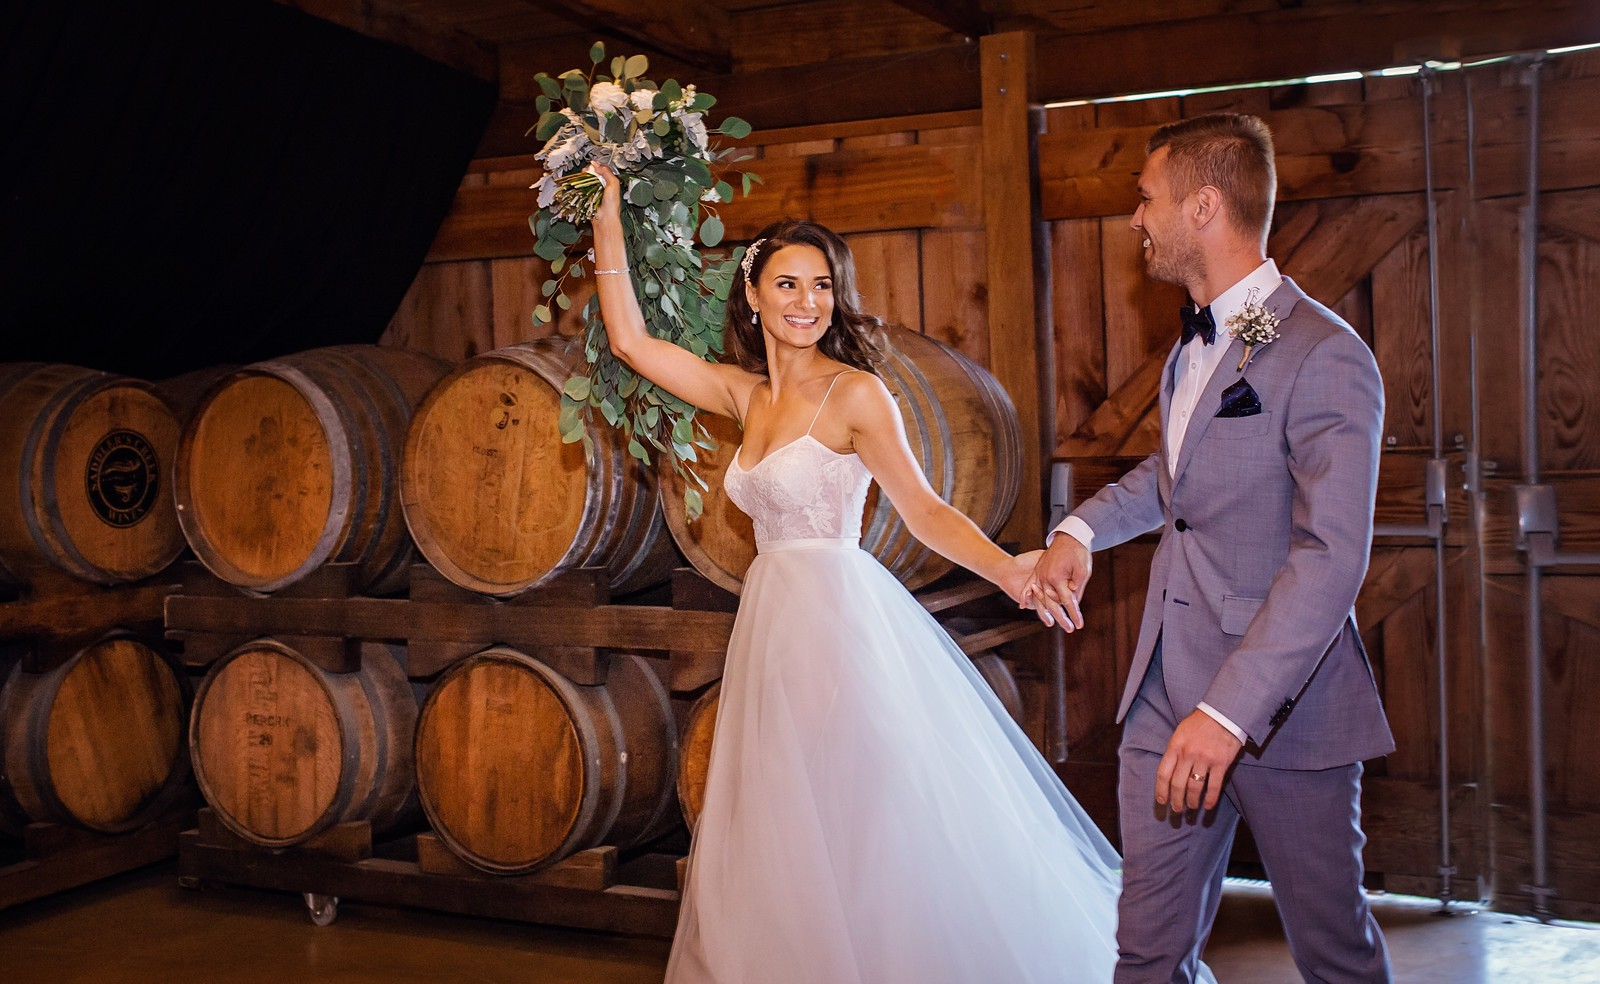 Monique Lhuillier Wedding Dresses - Stillwhite